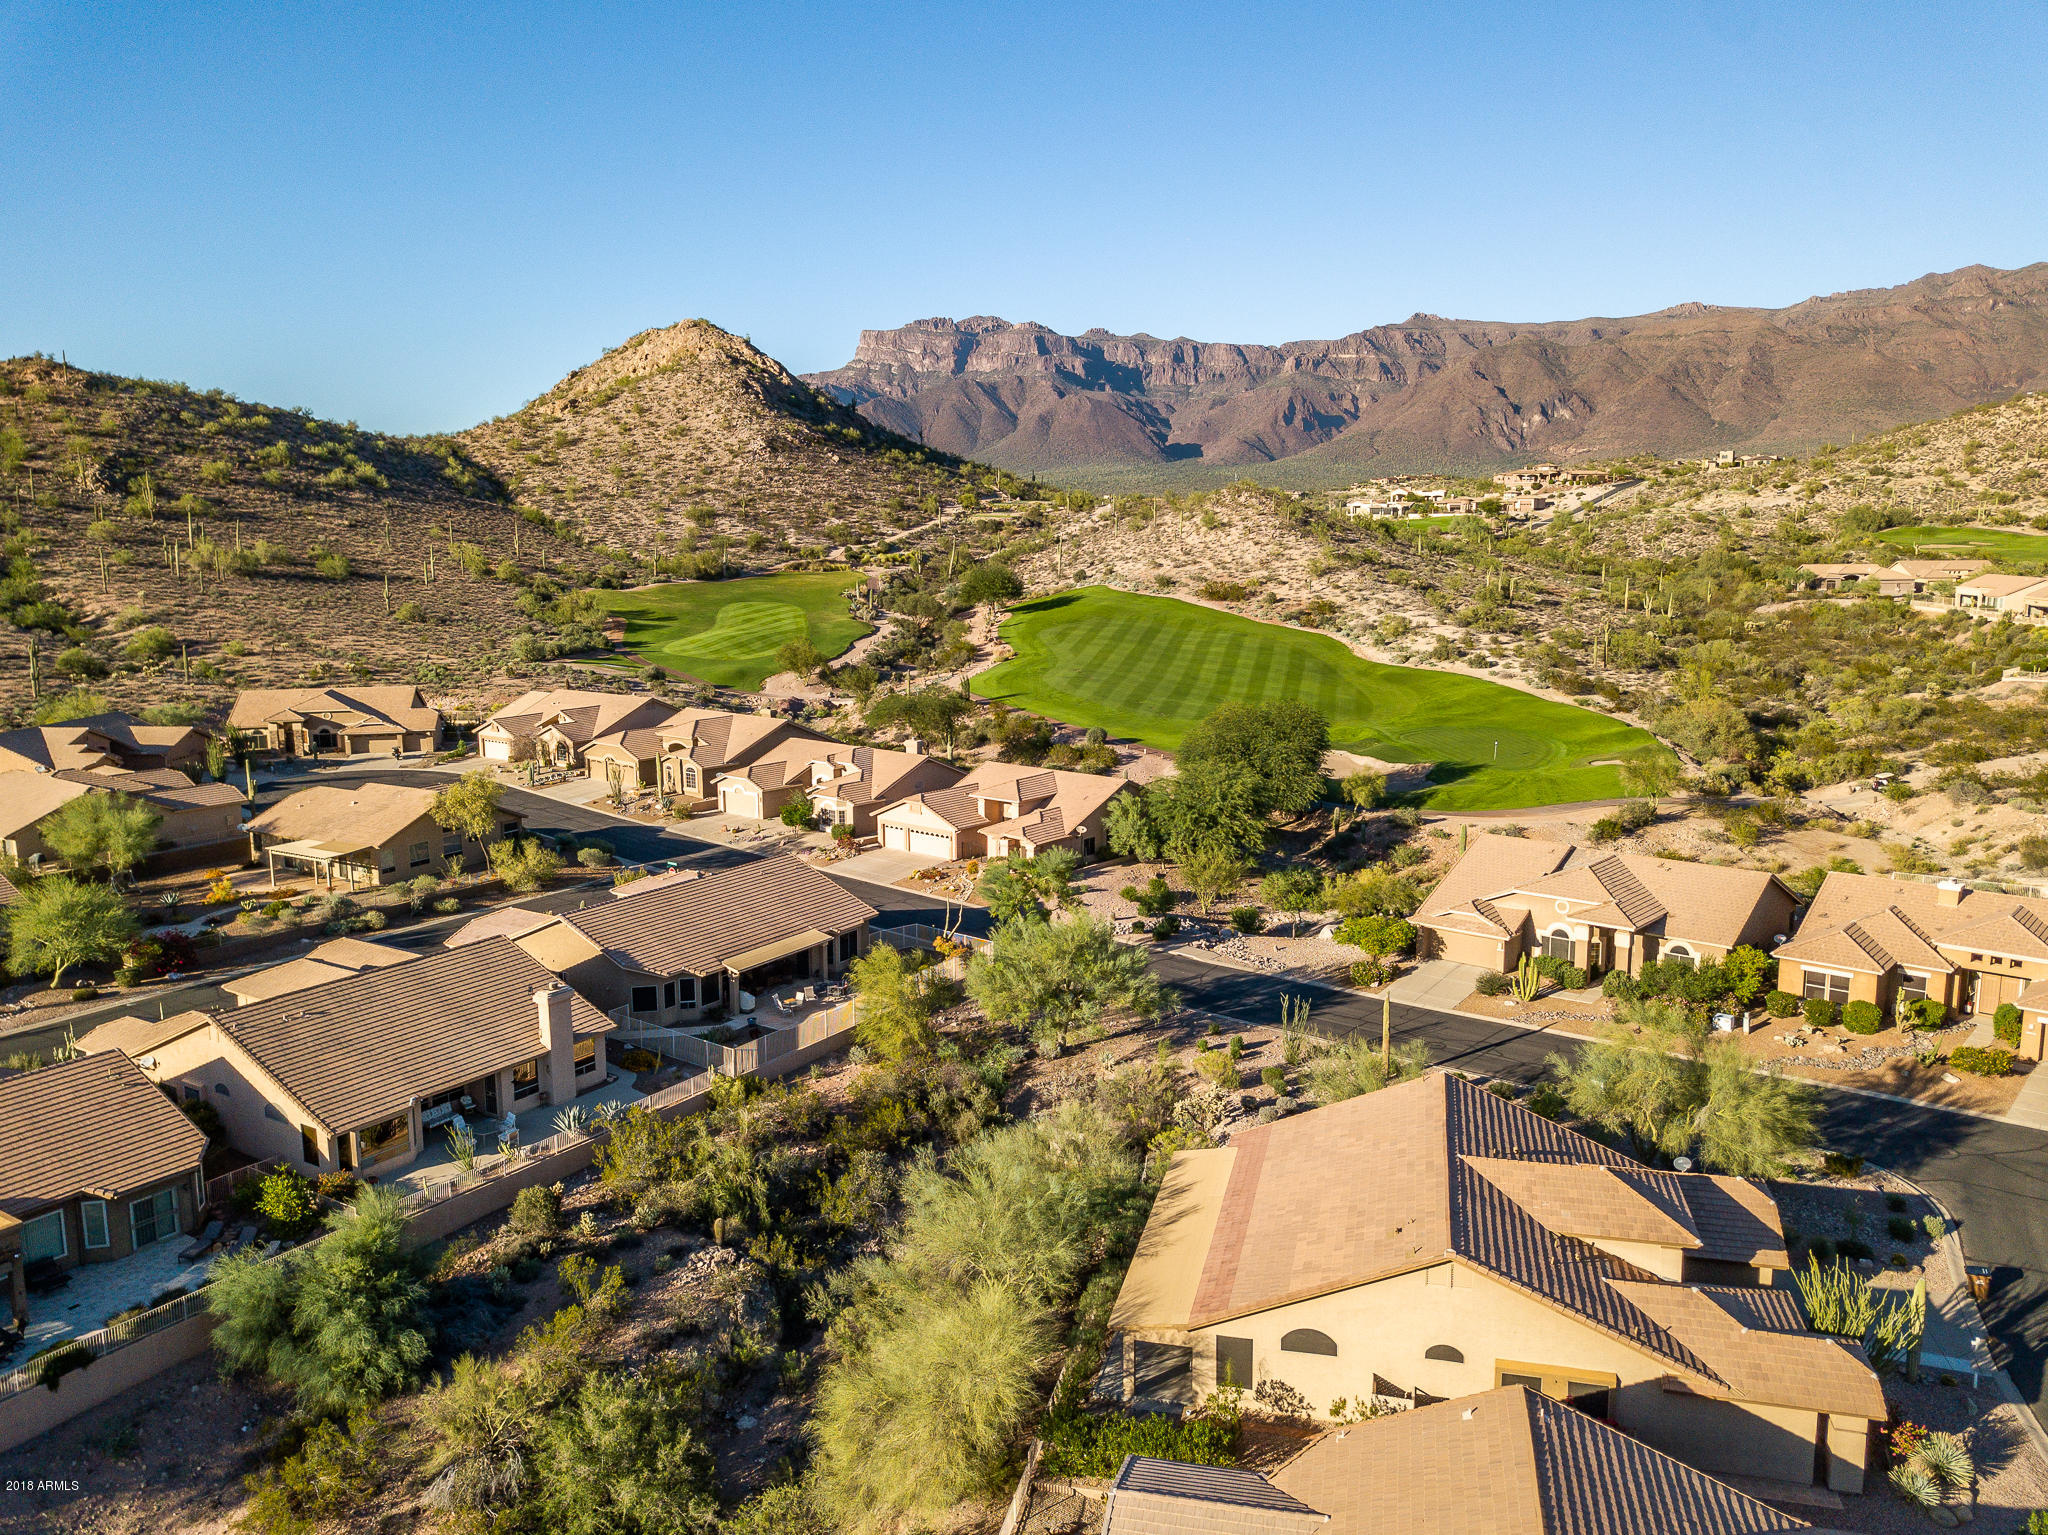 MLS 5845243 4790 S NIGHTHAWK Drive, Gold Canyon, AZ 85118 Gold Canyon AZ Mountainbrook Village